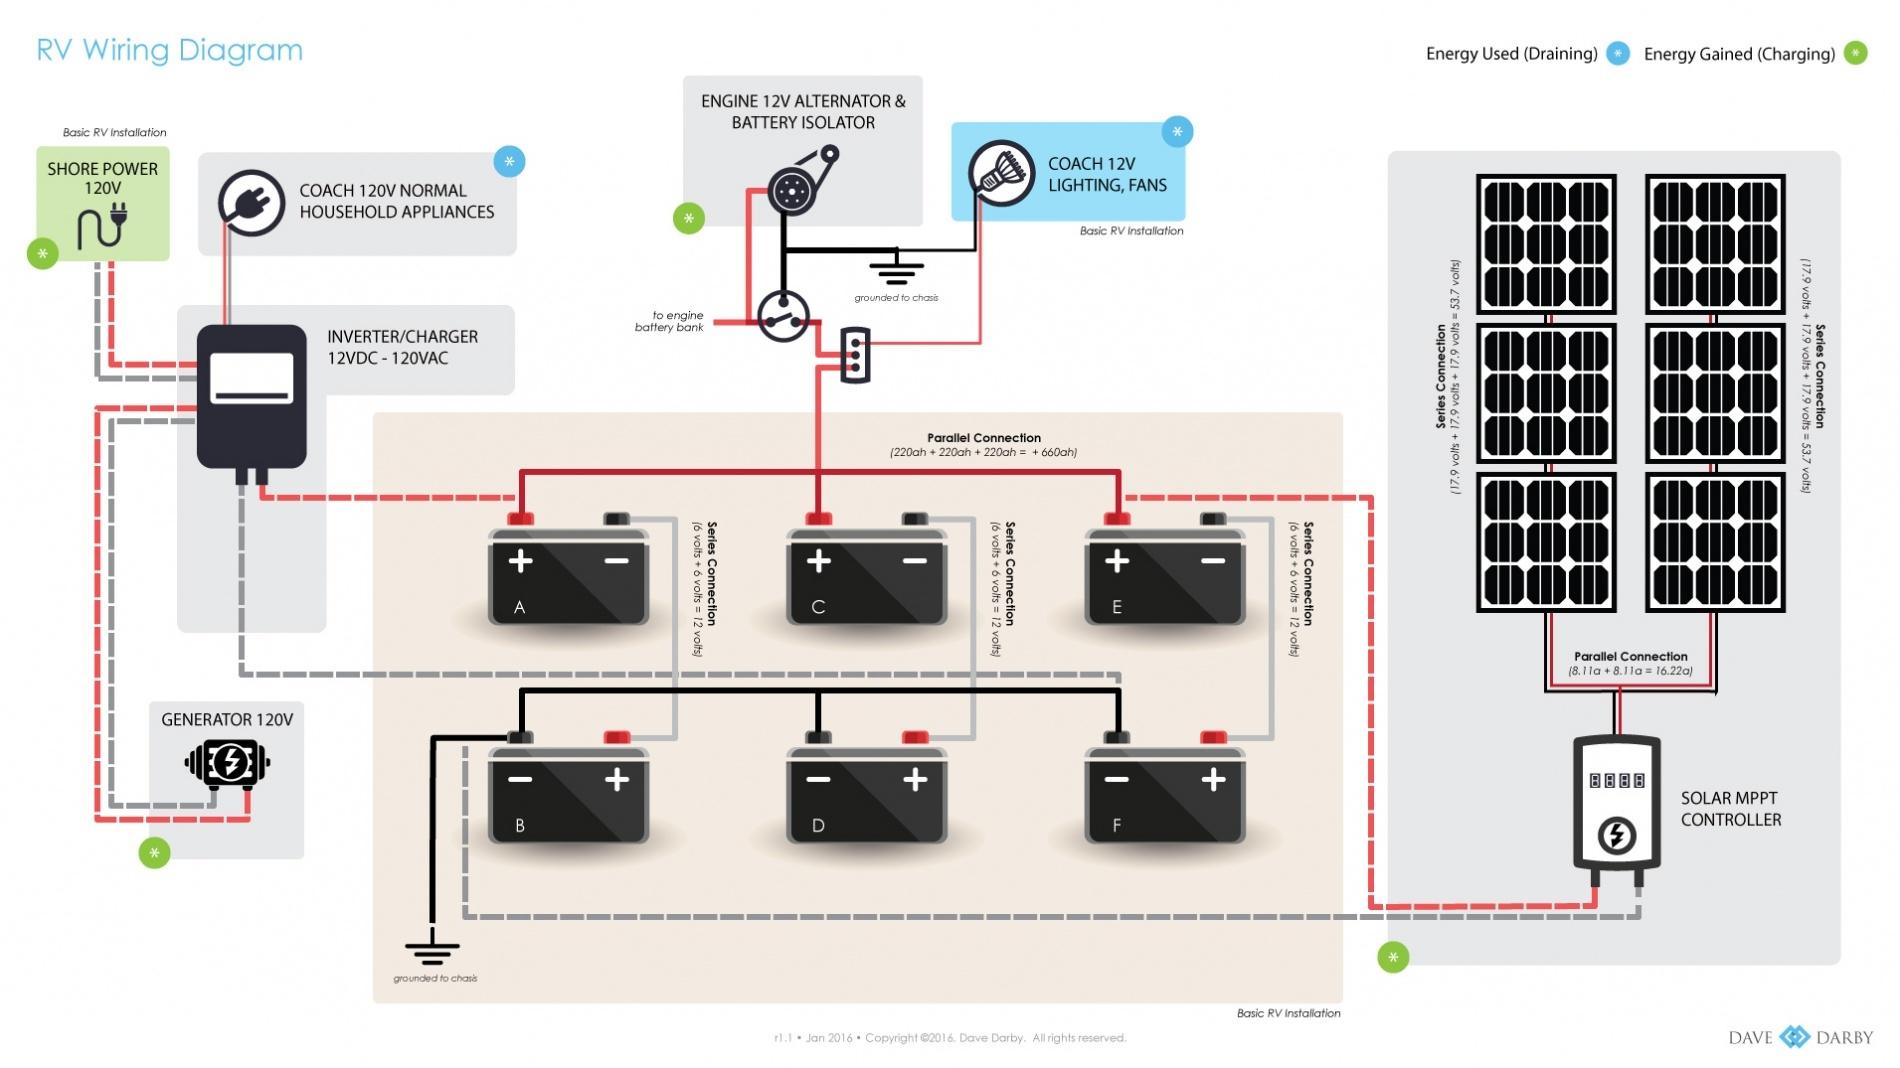 rv solar panel installation wiring diagram Collection-wiring diagram for rv solar system Solar Panel Wiring Diagram With Simple Panels Installation 1-l